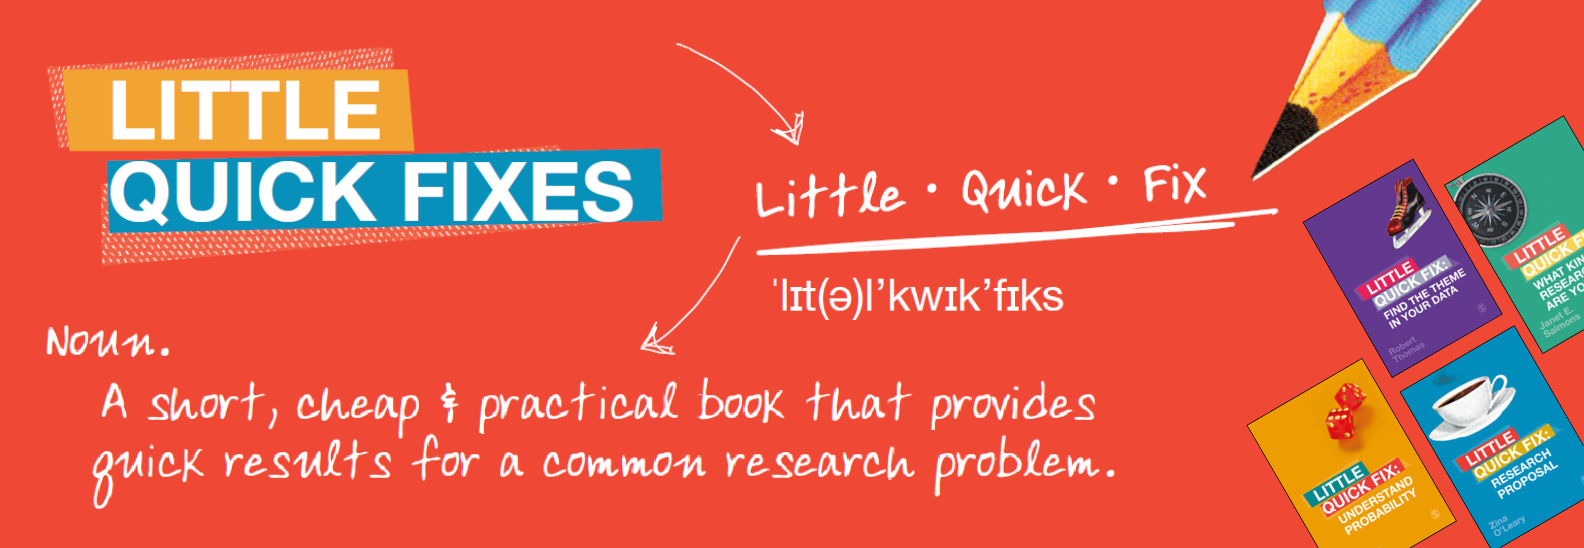 The Little Quick Fix book series